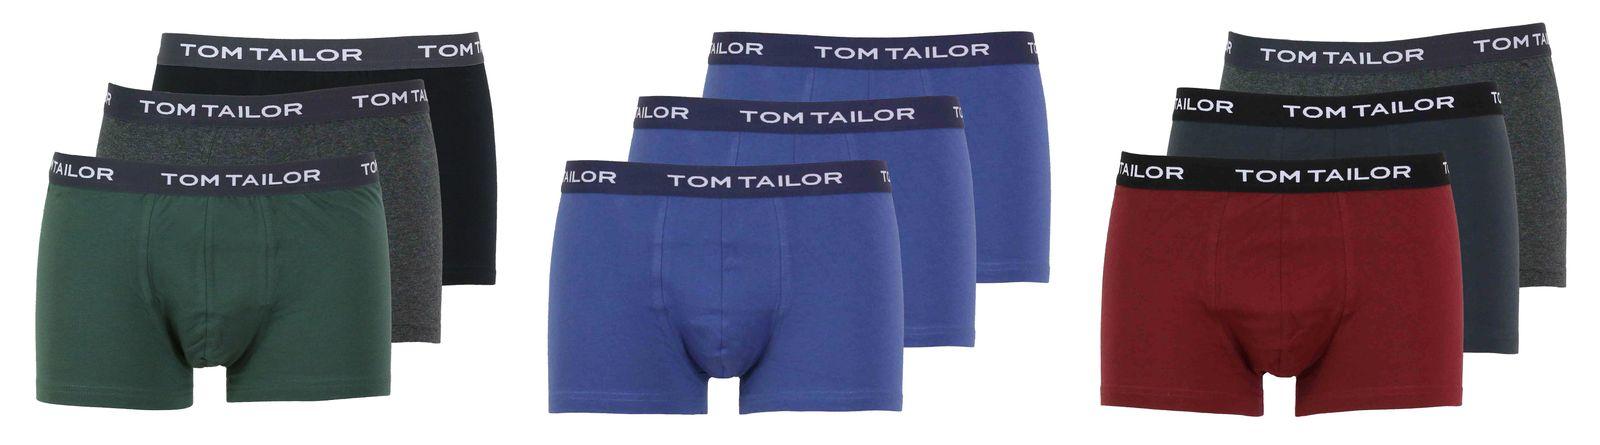 eb9835ae43bb79 Details zu Tom Tailor Herren 3er Pack Boxershorts